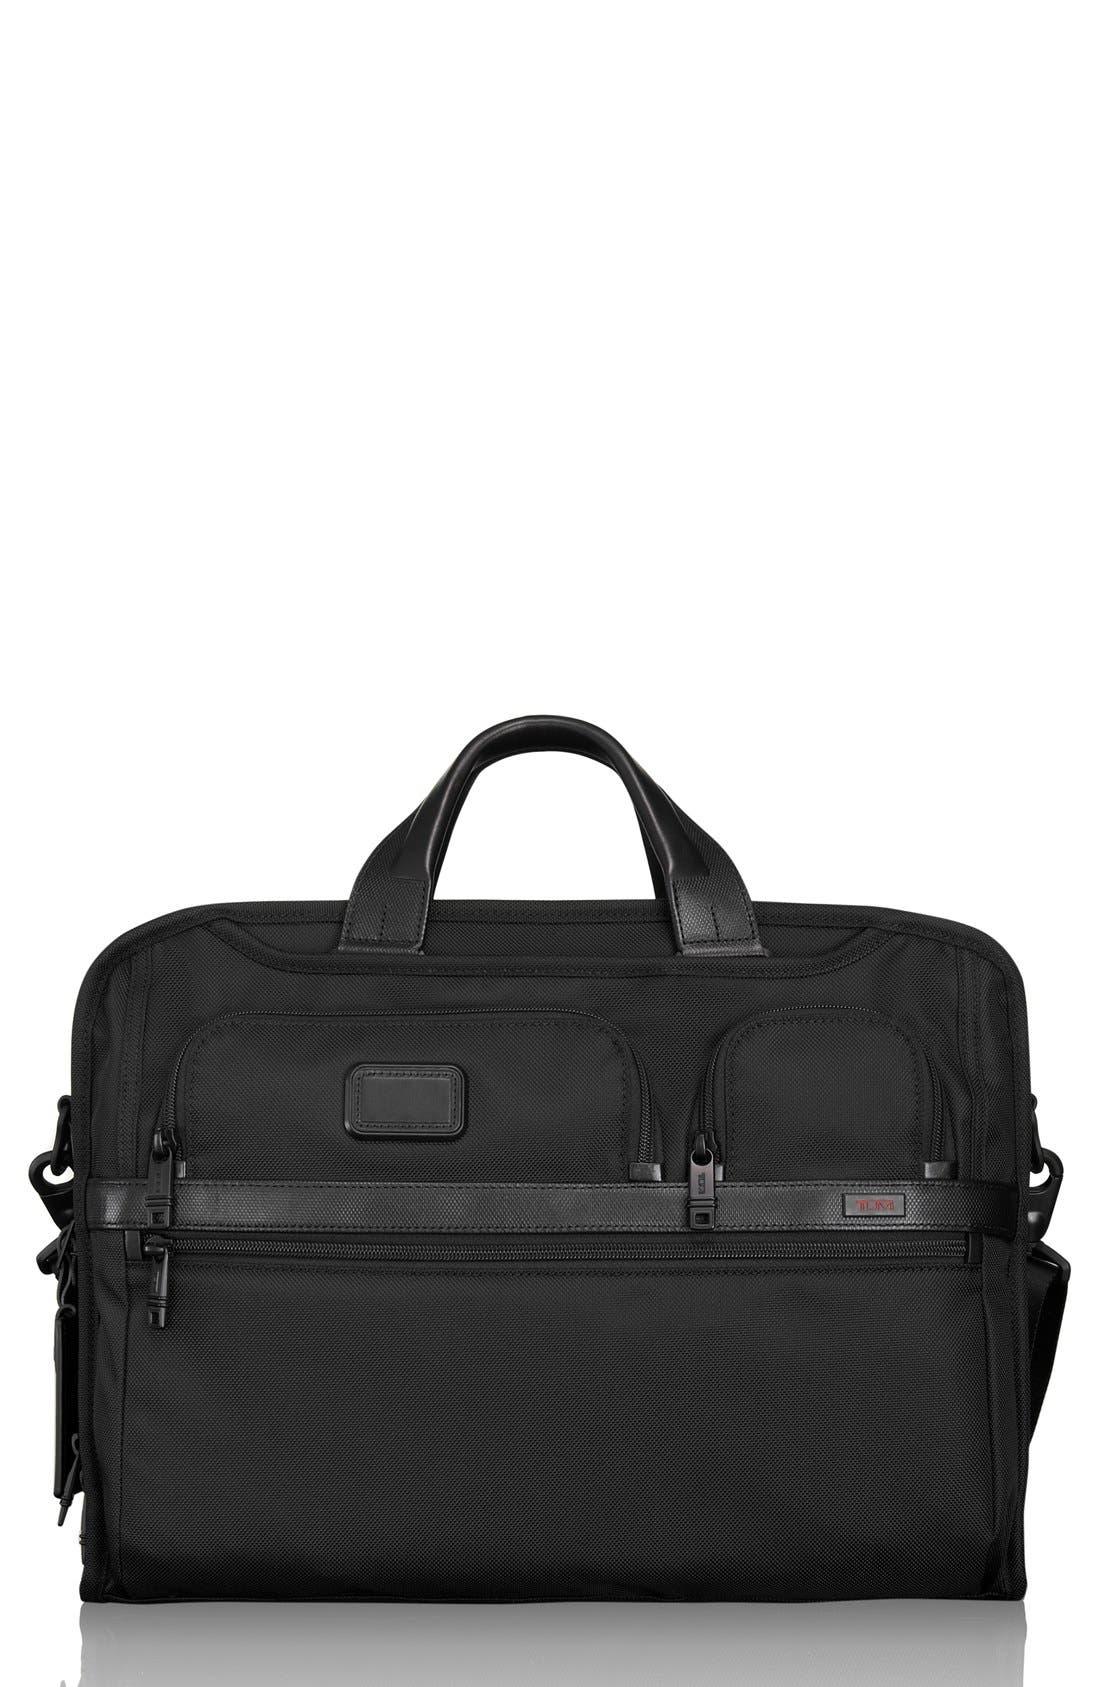 Alternate Image 1 Selected - Tumi 'Alpha 2' Laptop Briefcase with Tumi ID Lock Pocket